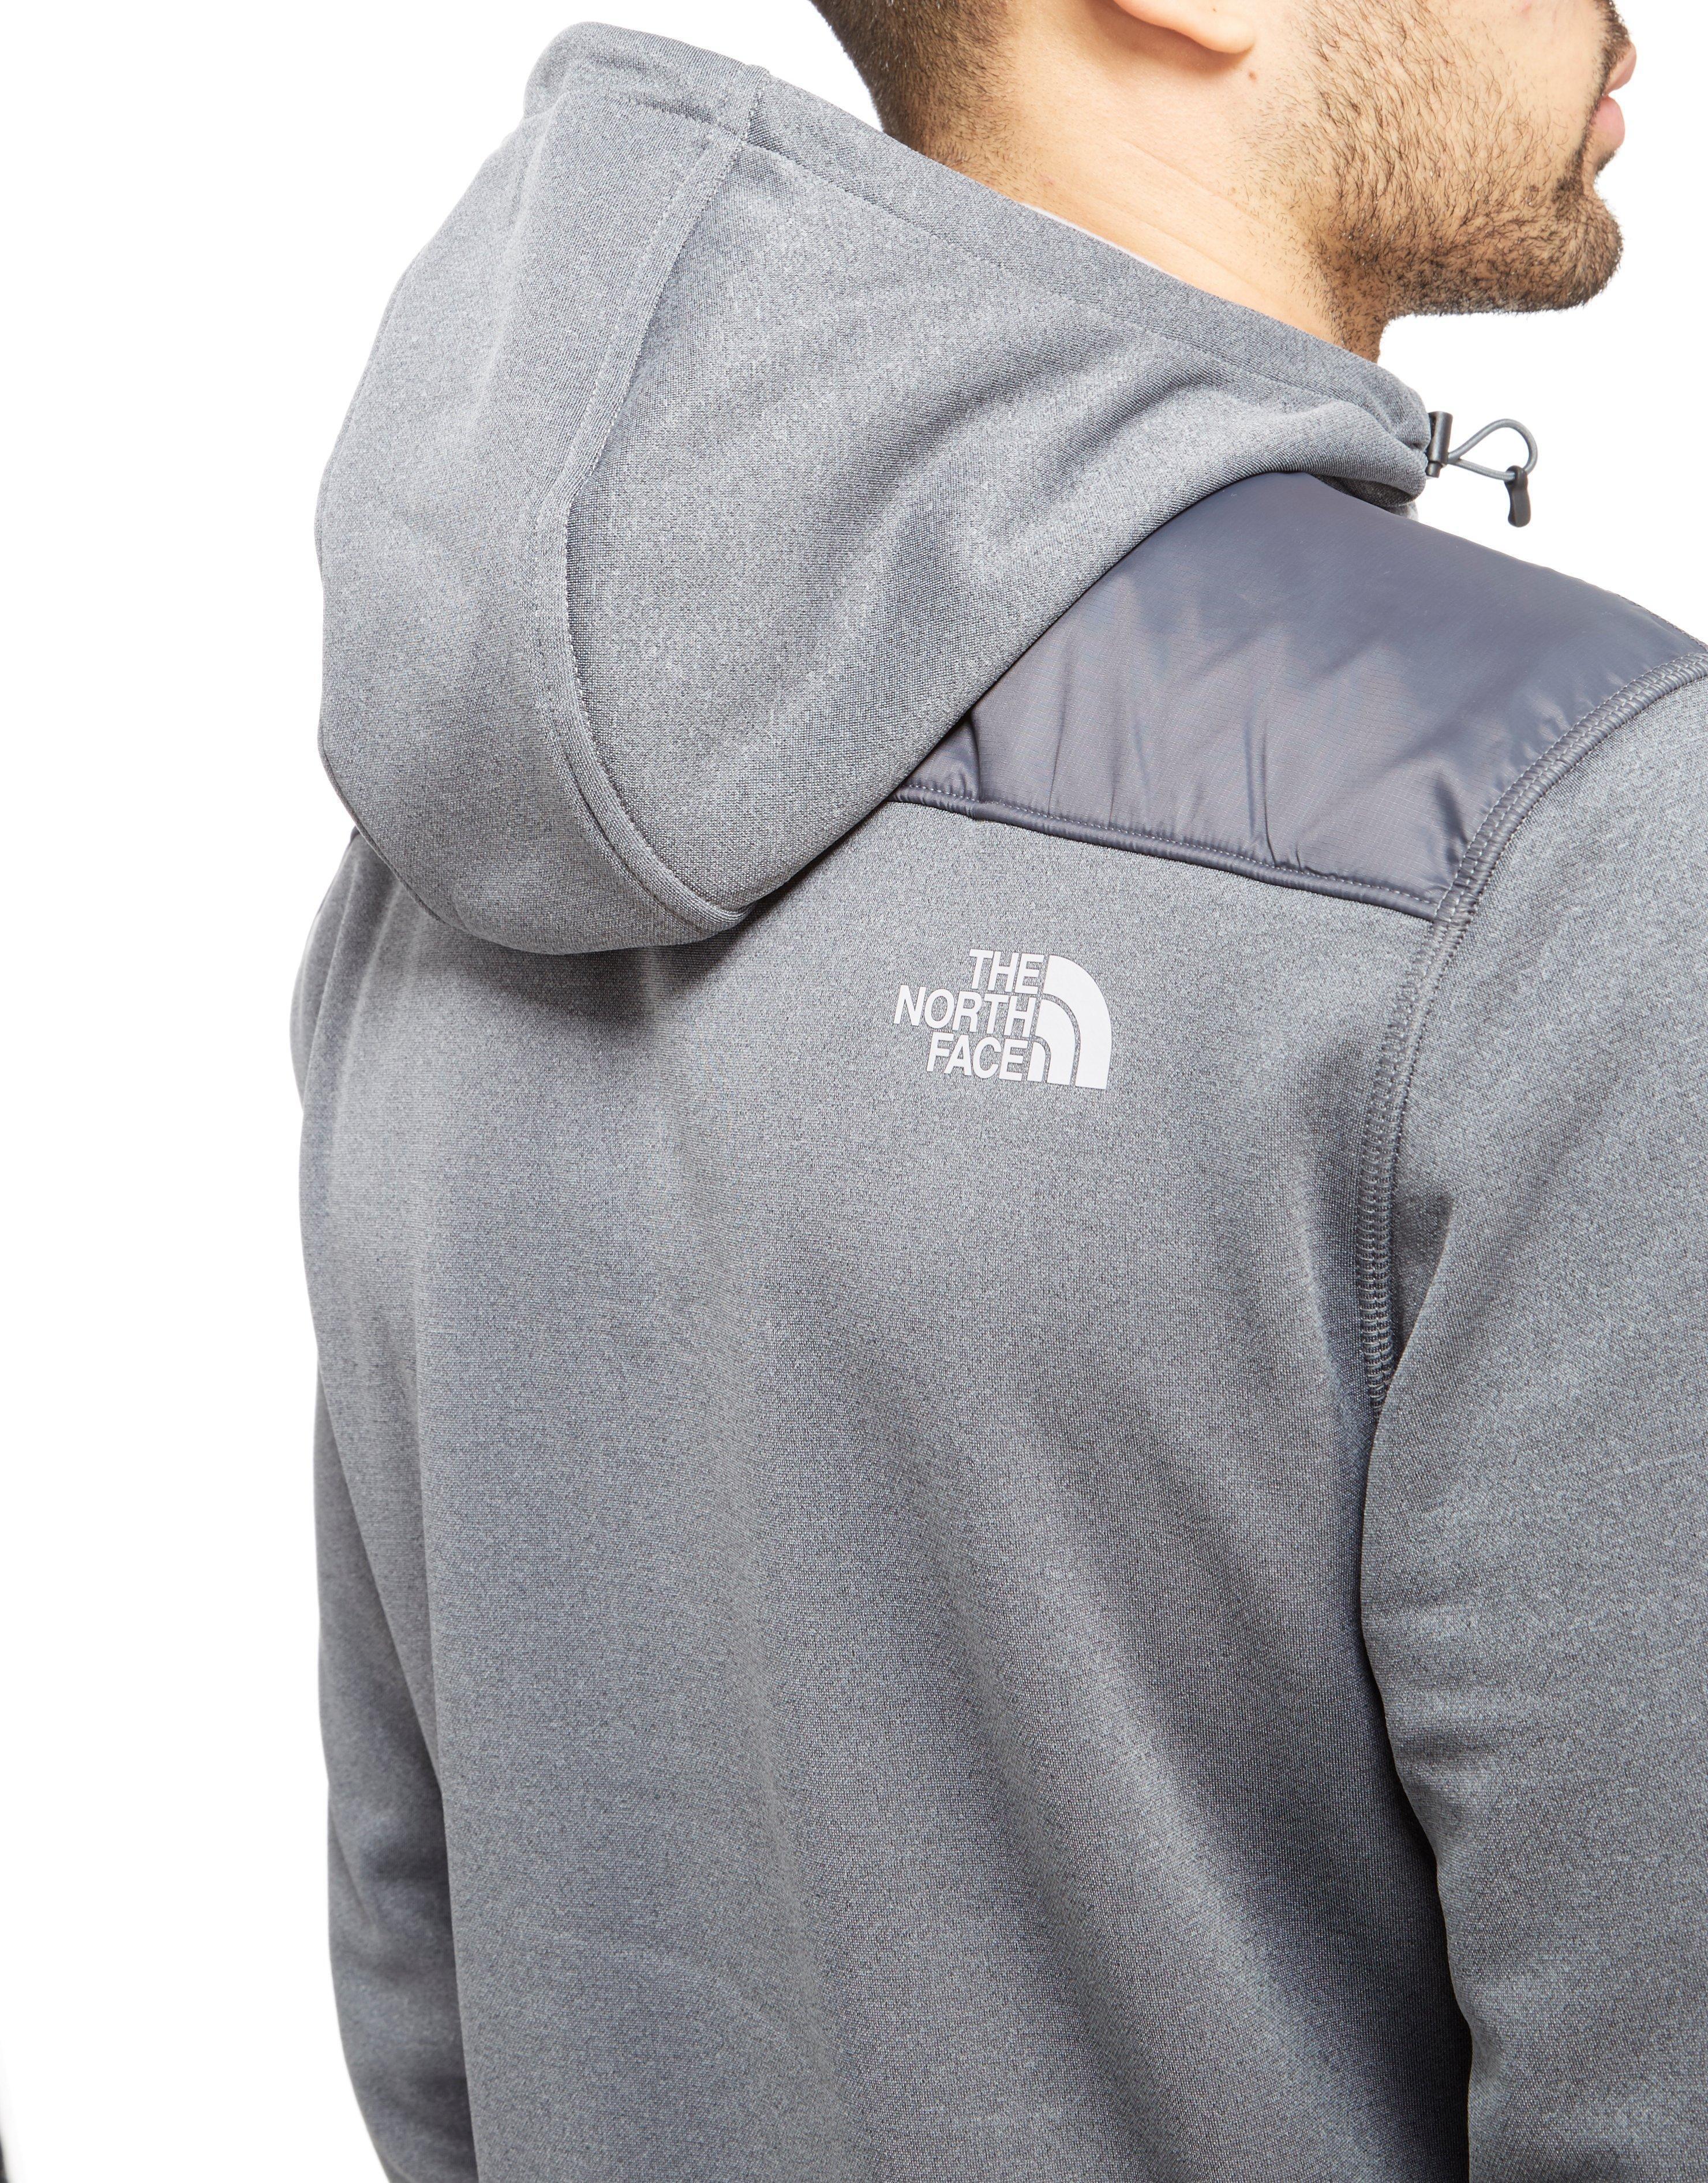 Lyst - The North Face Mittellegi 1 4 Zip Hoody in Gray for Men d07ed0be8d